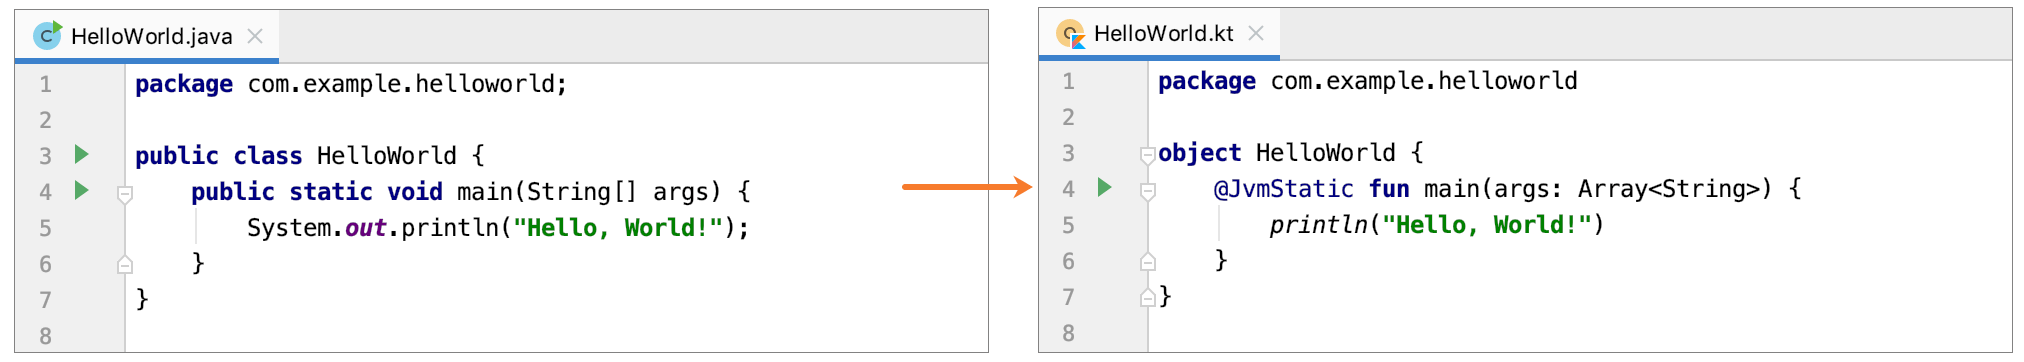 Converting Java file to Kotlin